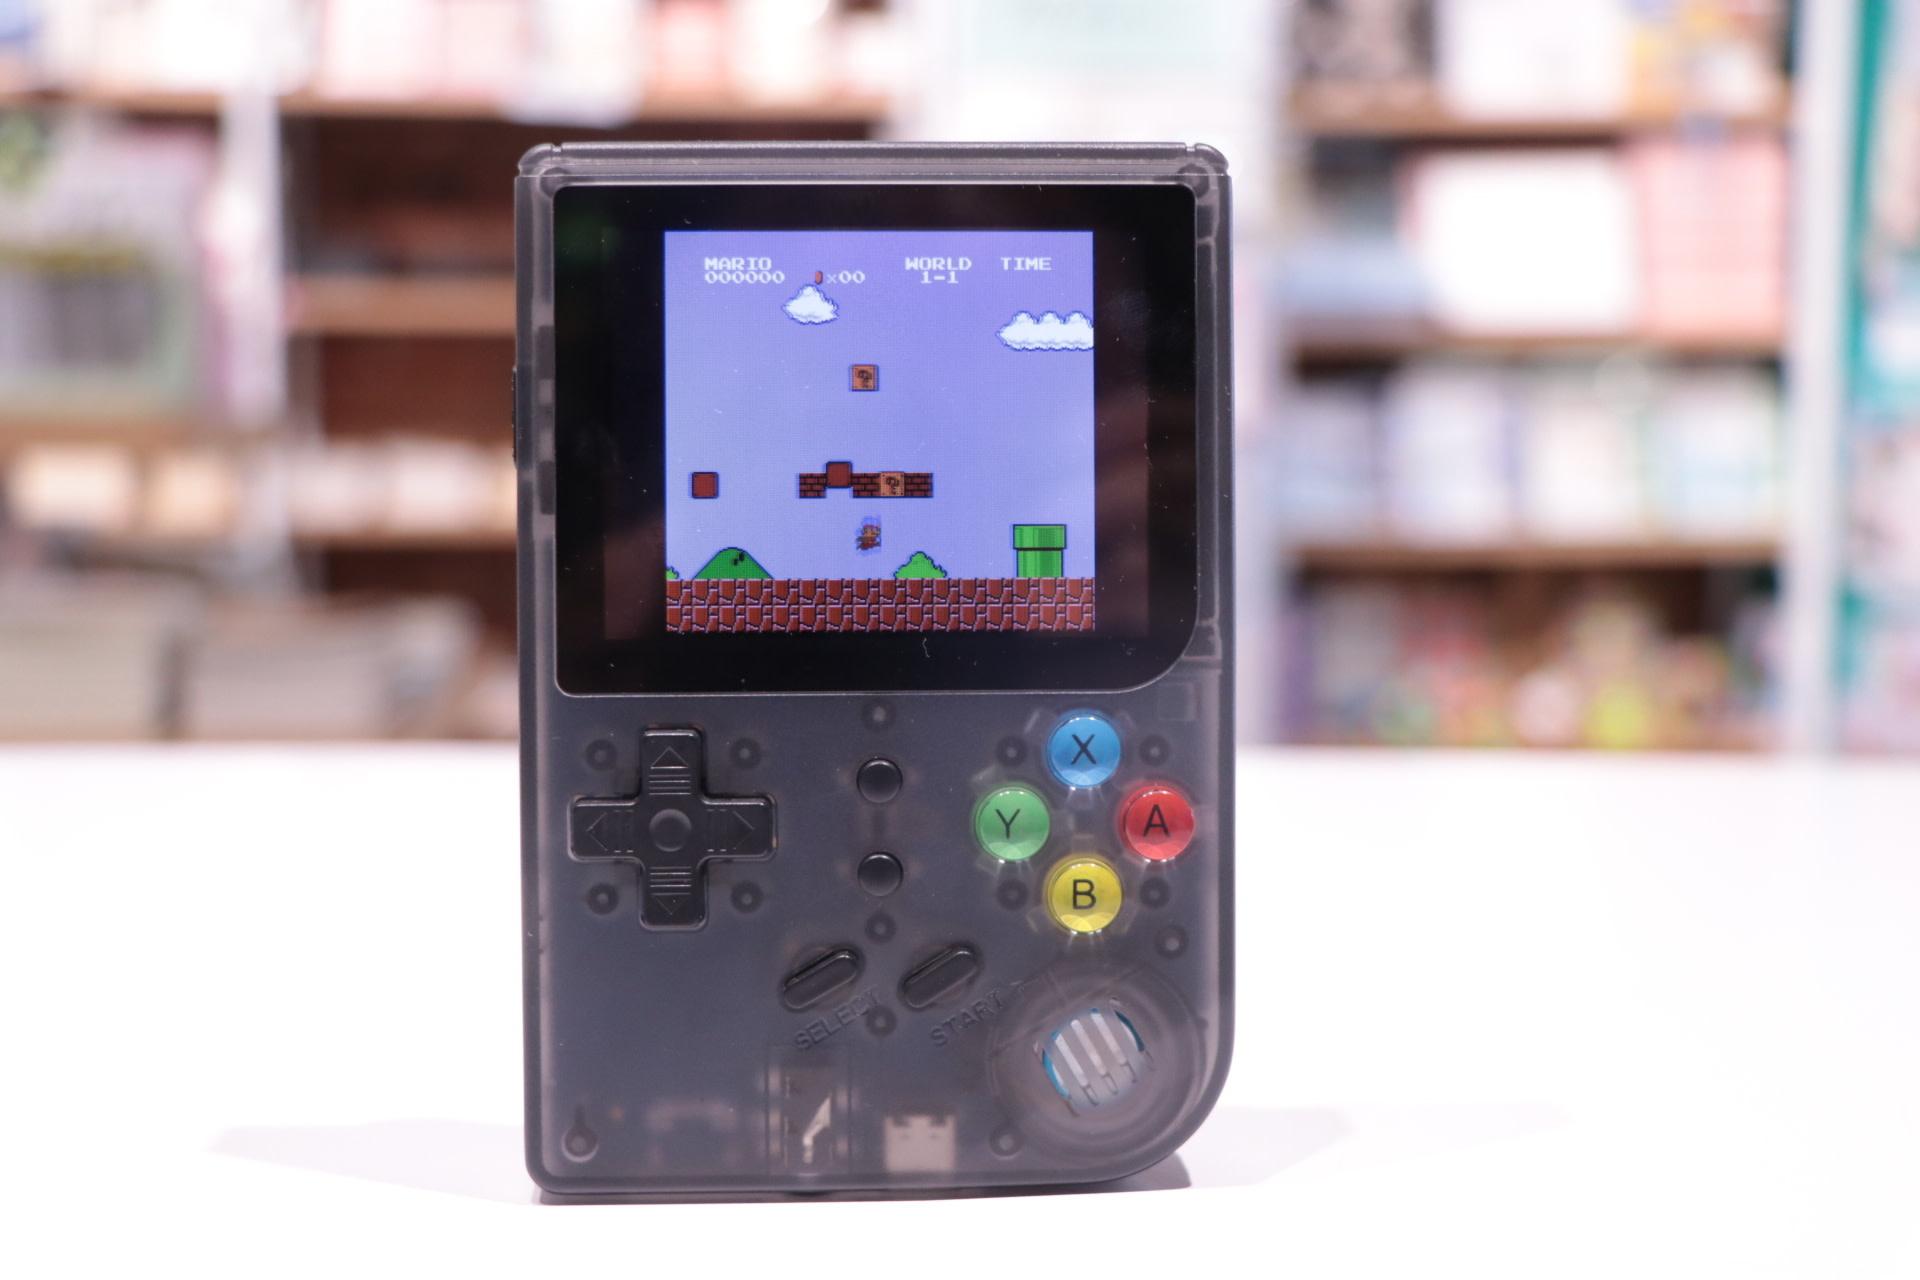 RG300 3000 Game Boy